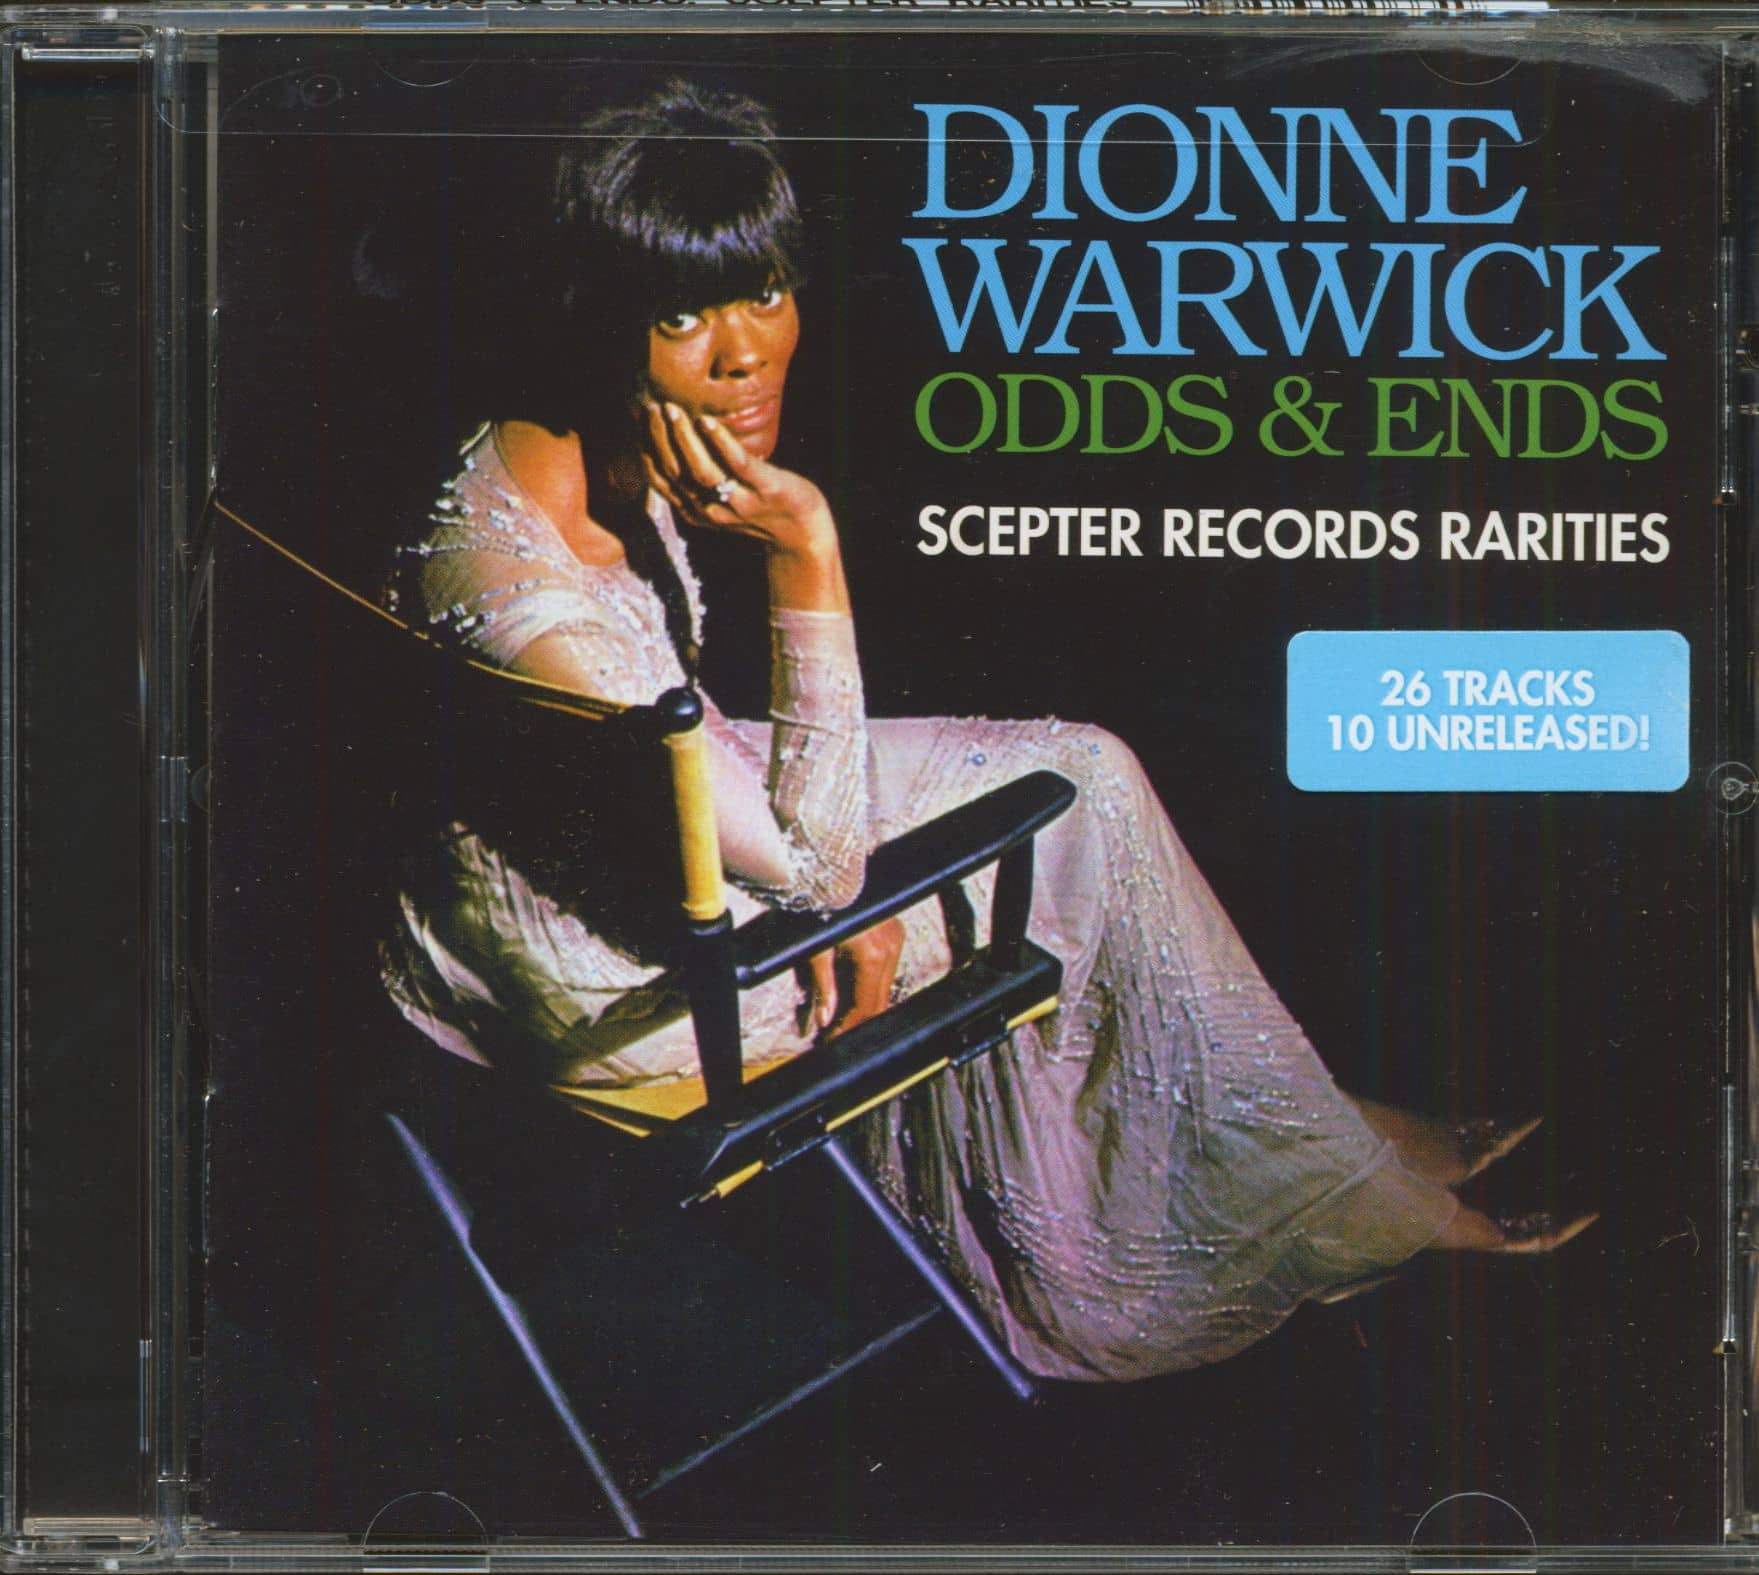 Dionne Warwick CD: Odds & Ends